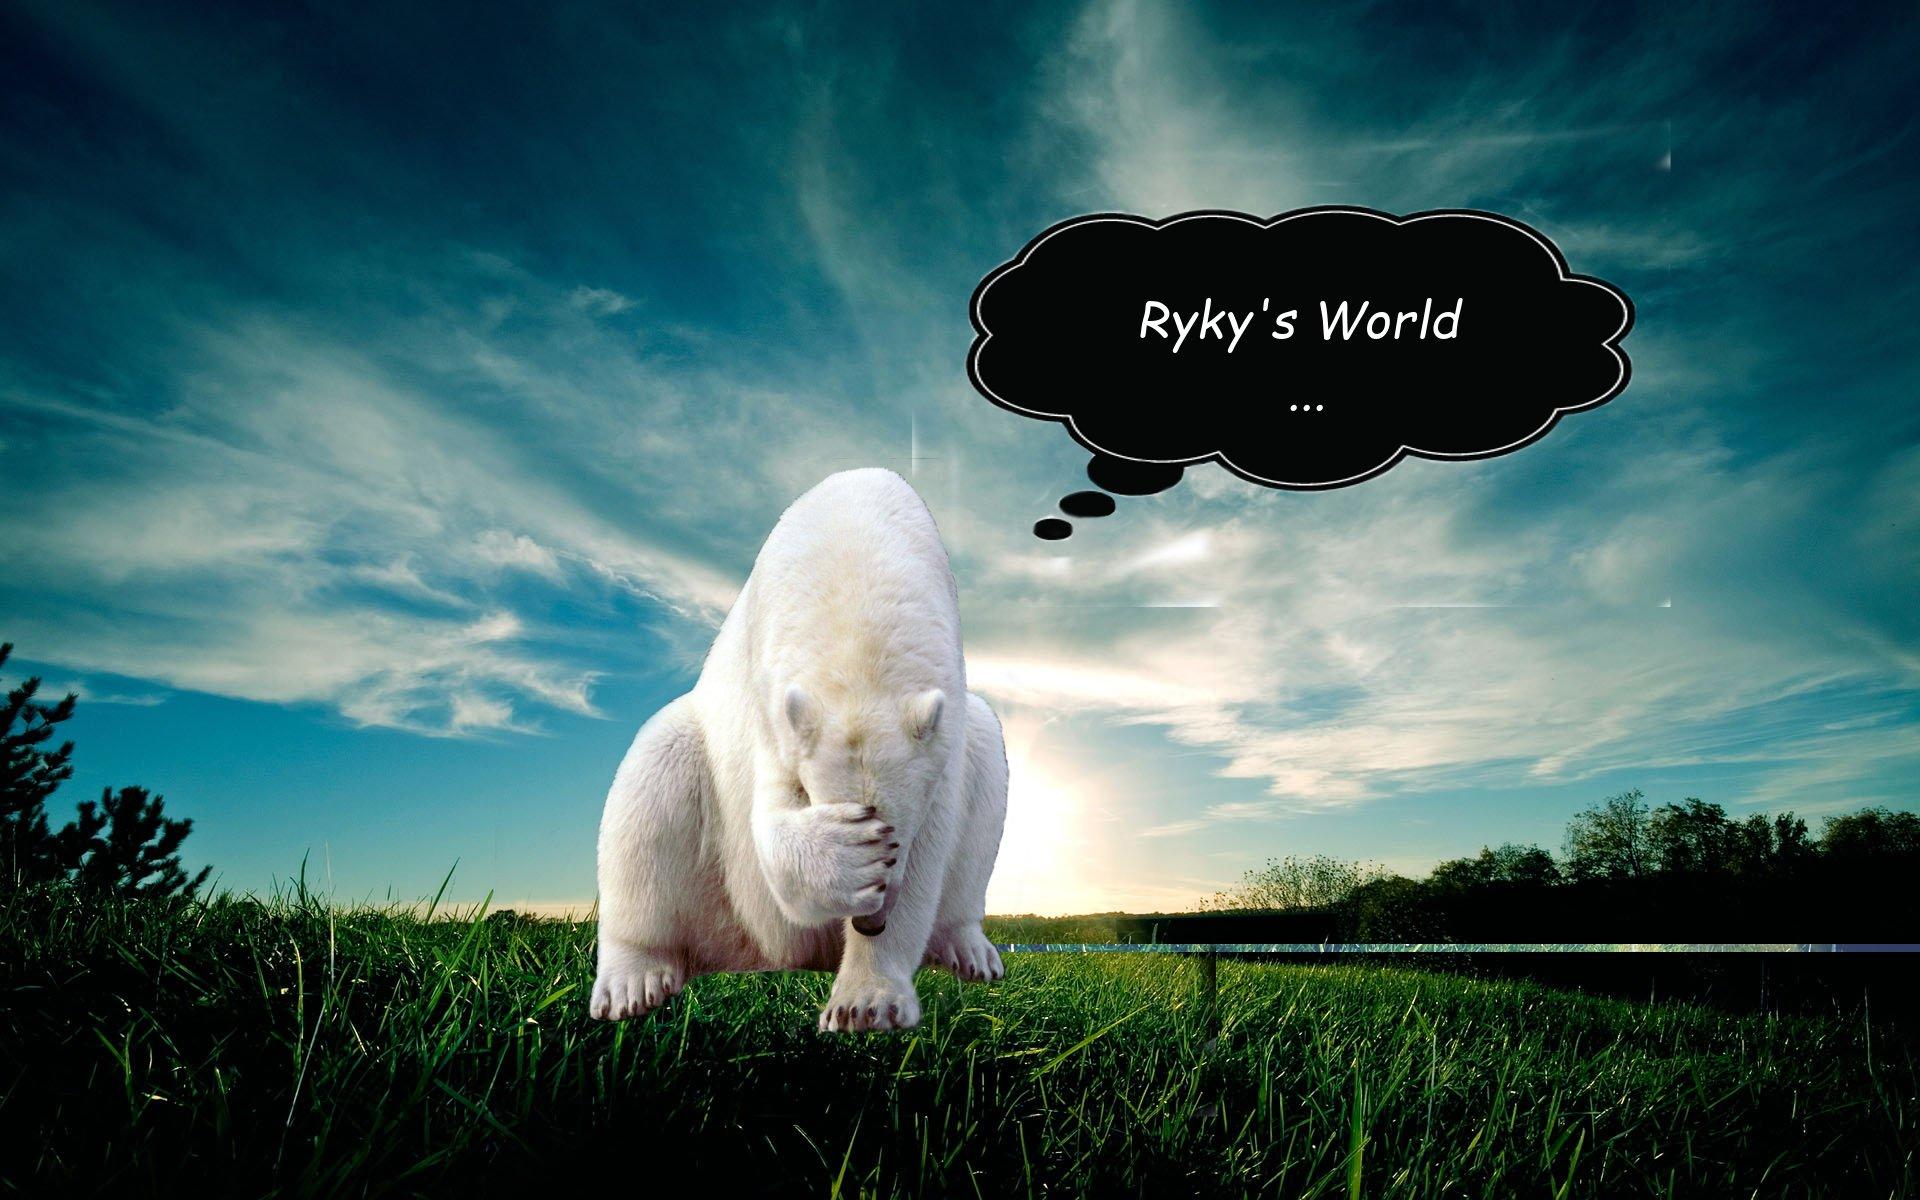 Ryky's World